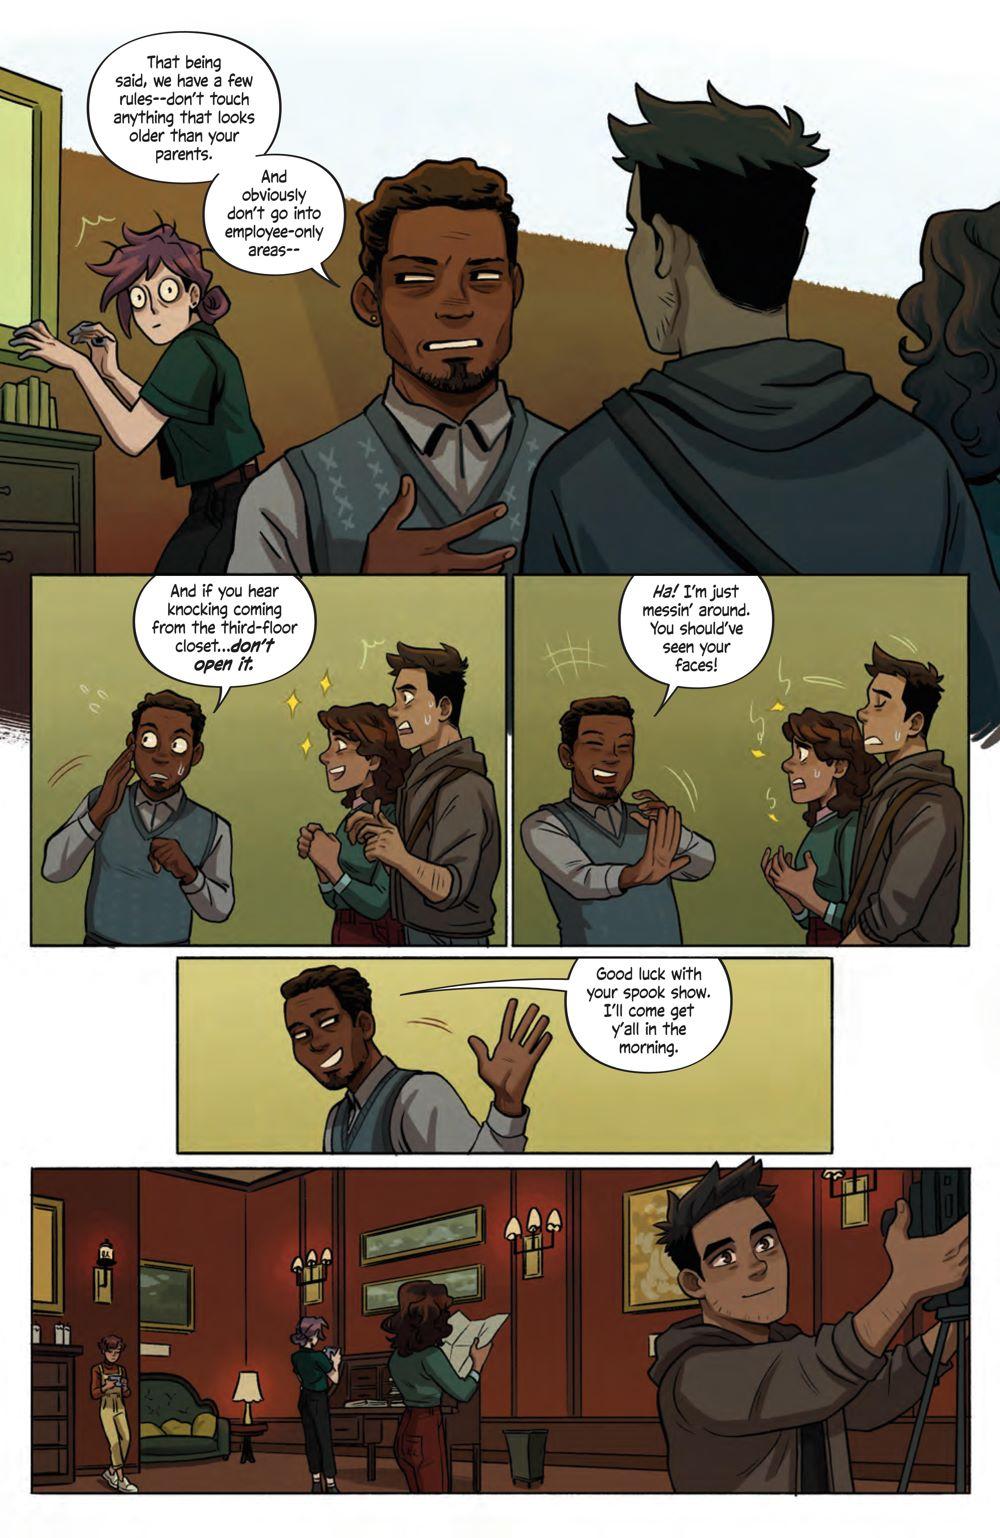 SpecterInspectors_003_PRESS_4 ComicList Previews: SPECTER INSPECTORS #3 (OF 5)